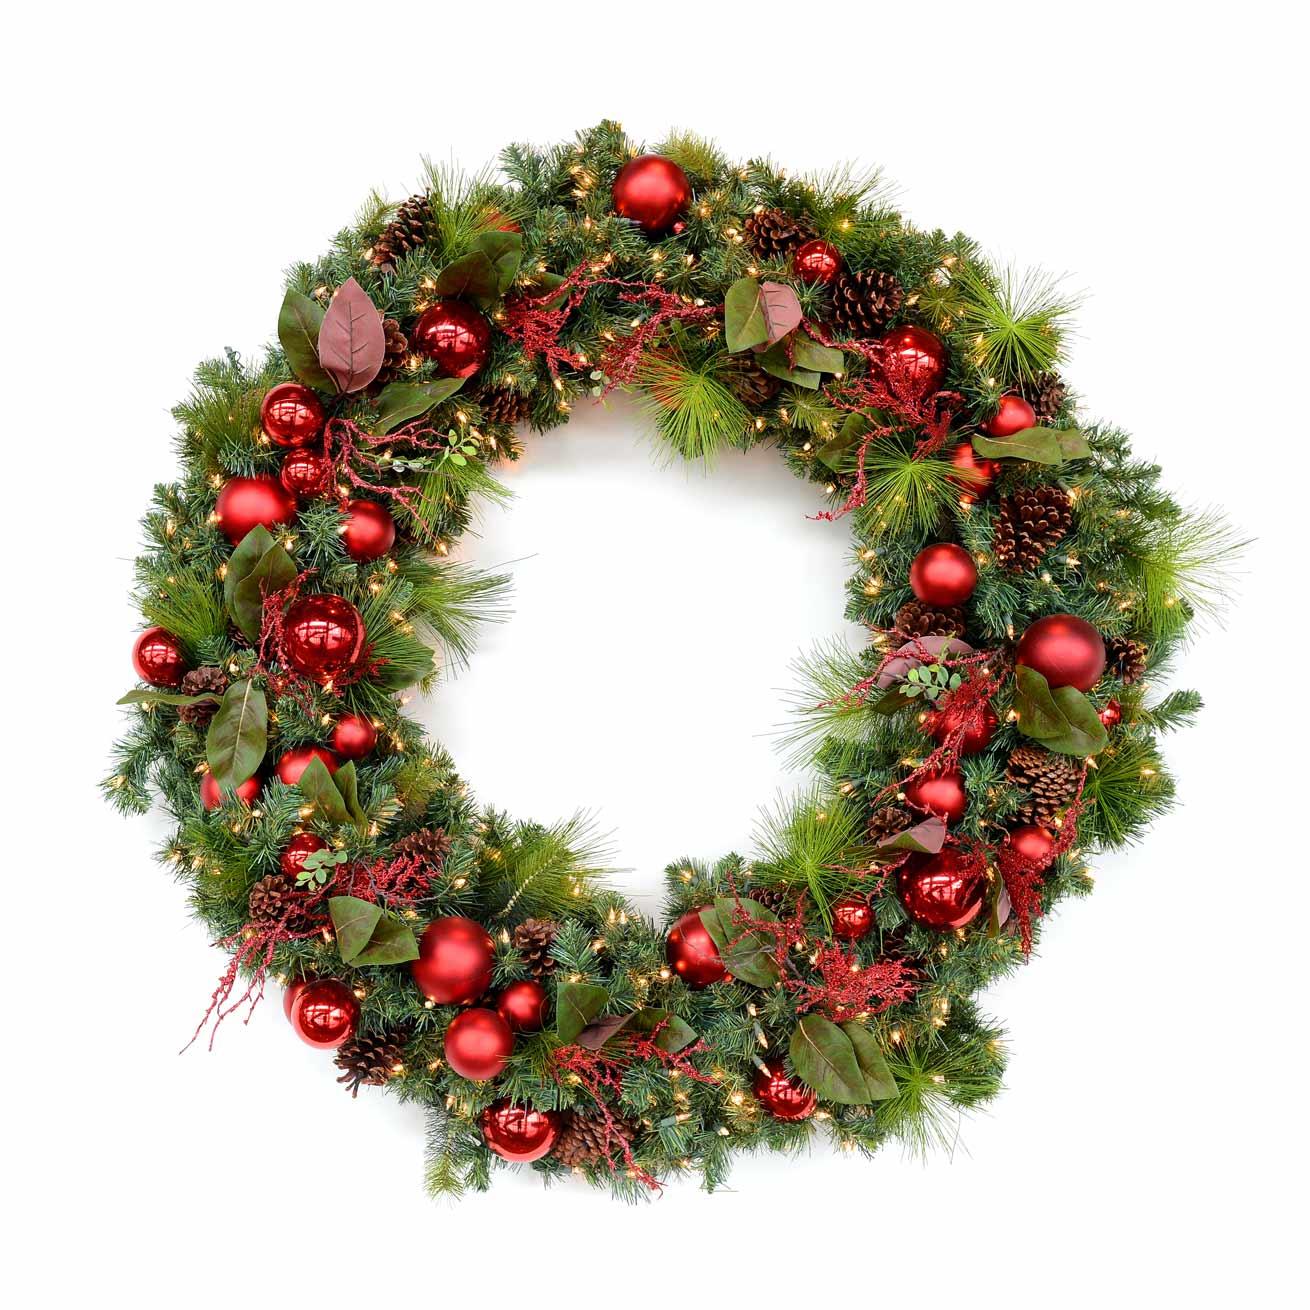 Christmas Wreath 16 inch